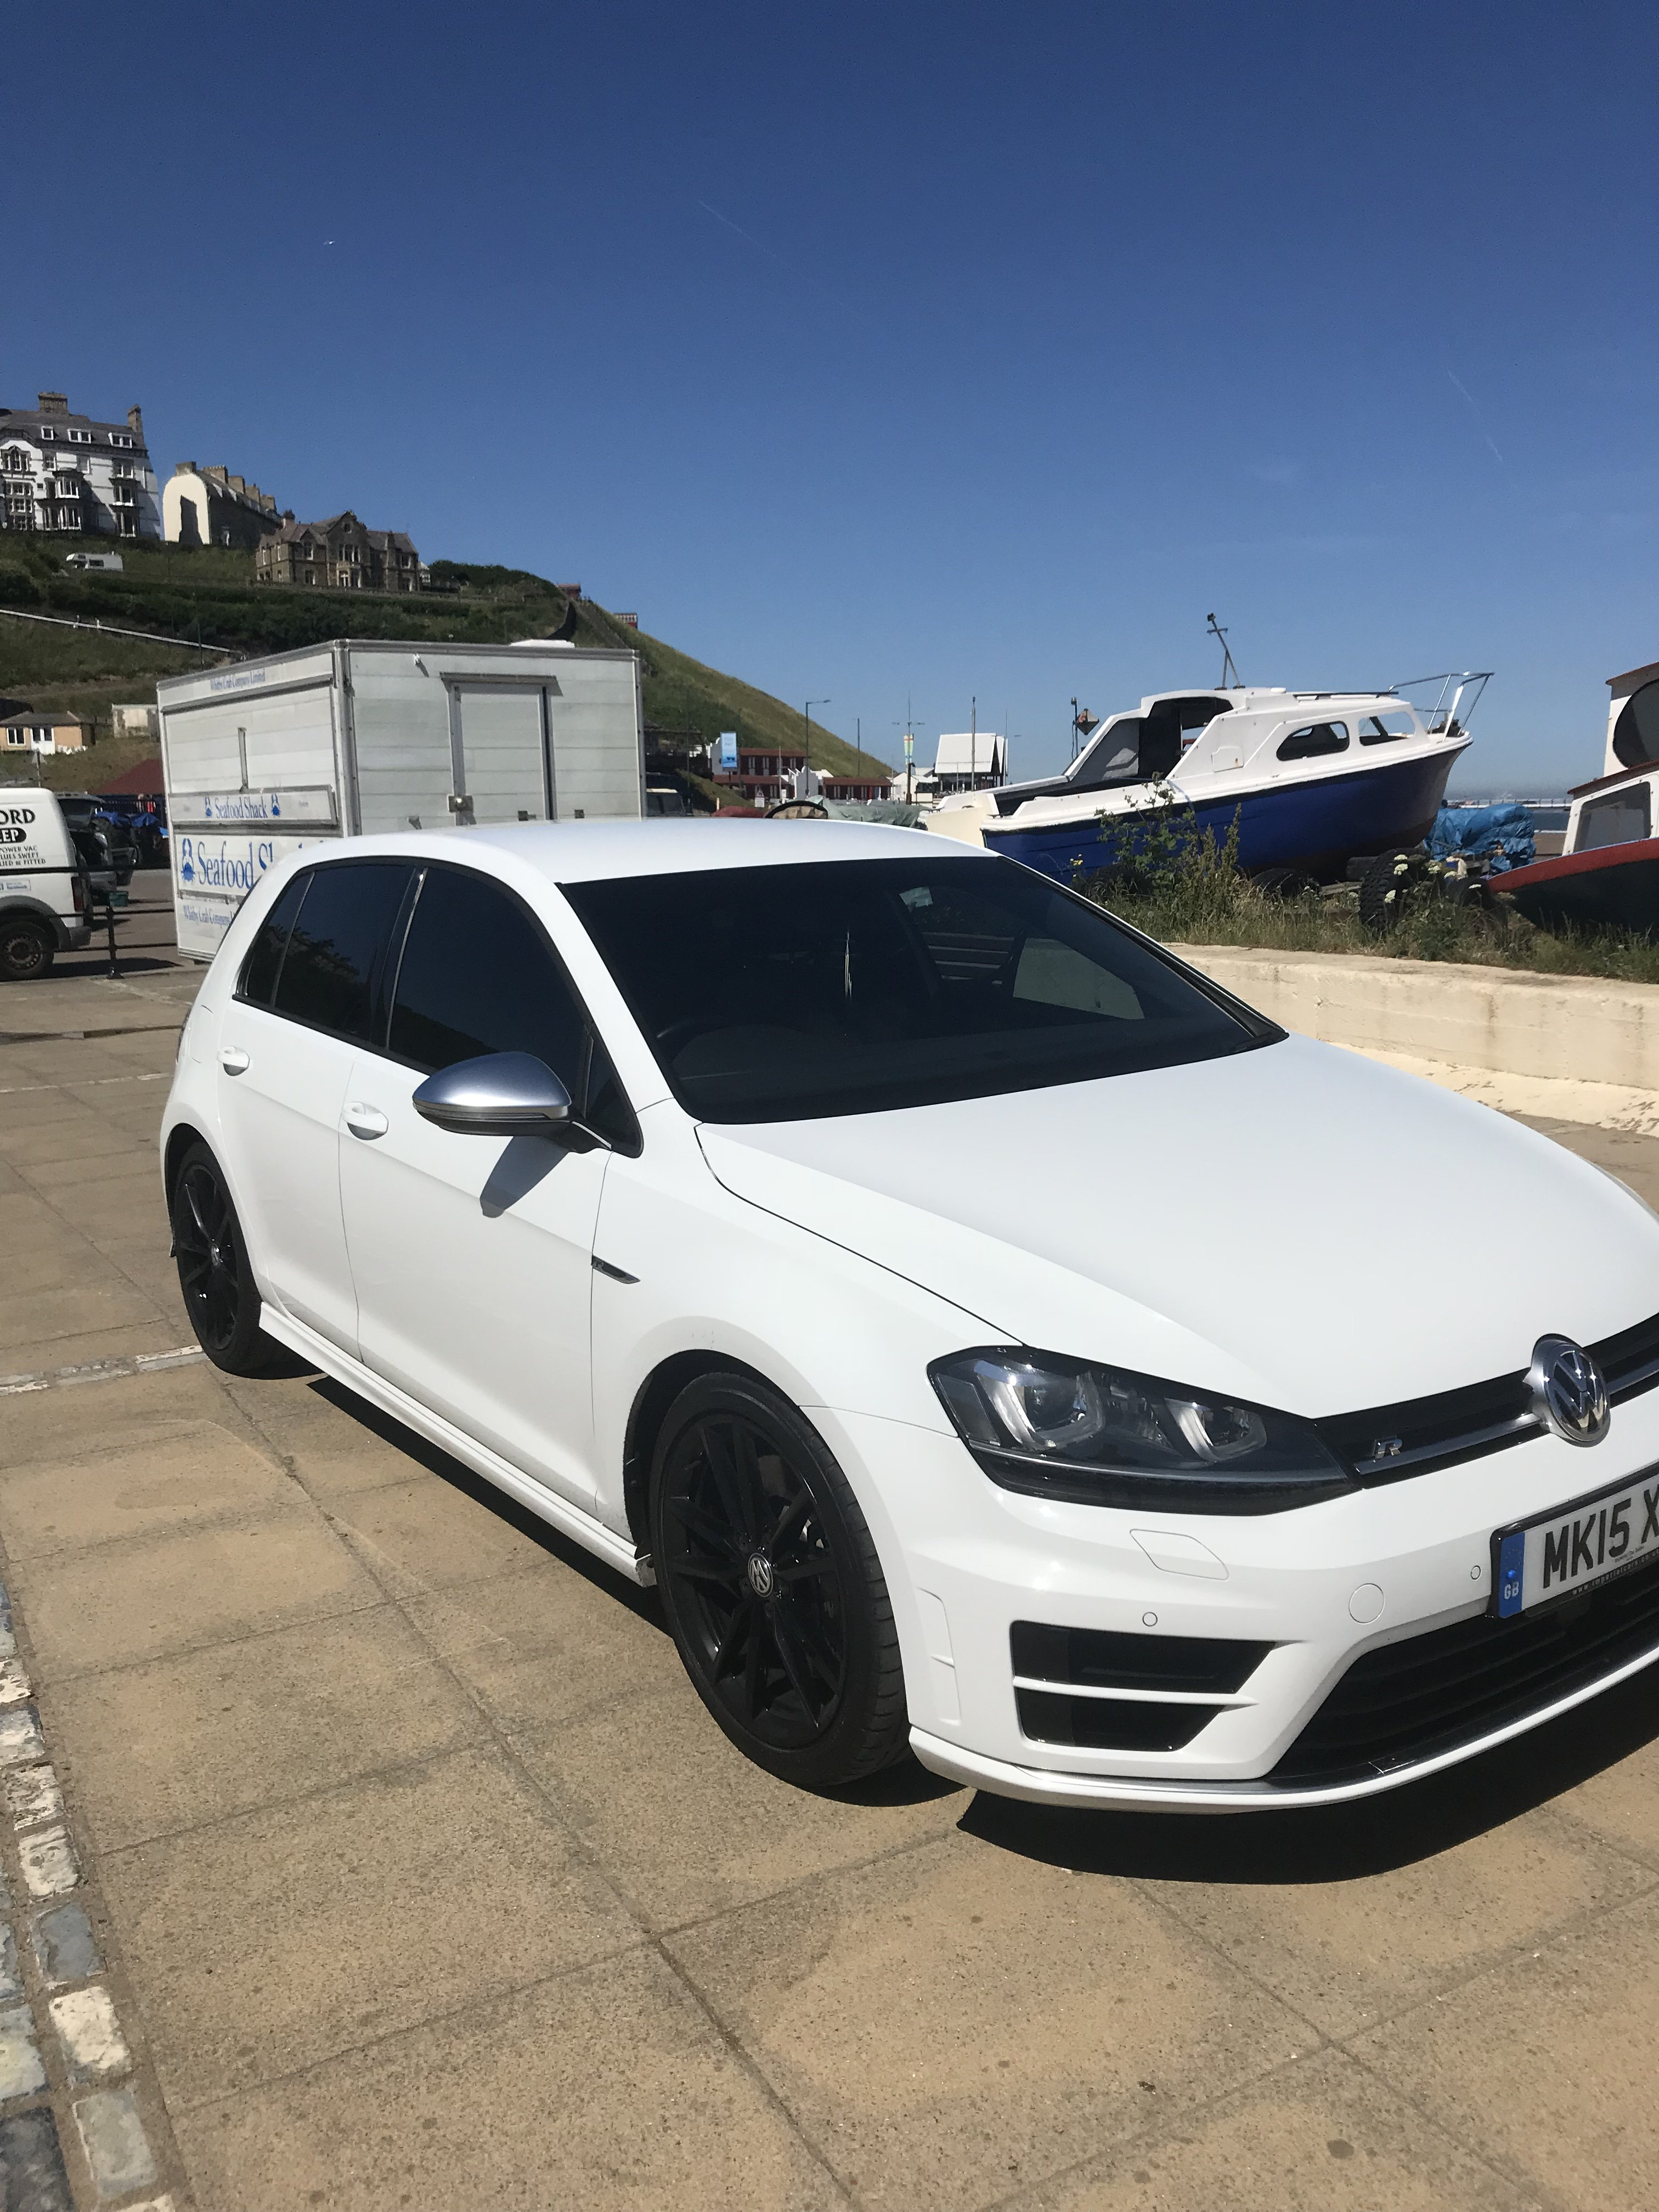 Dsg Whining noise in 1st - VW Golf R MK7 Chat - VWROC - VW R